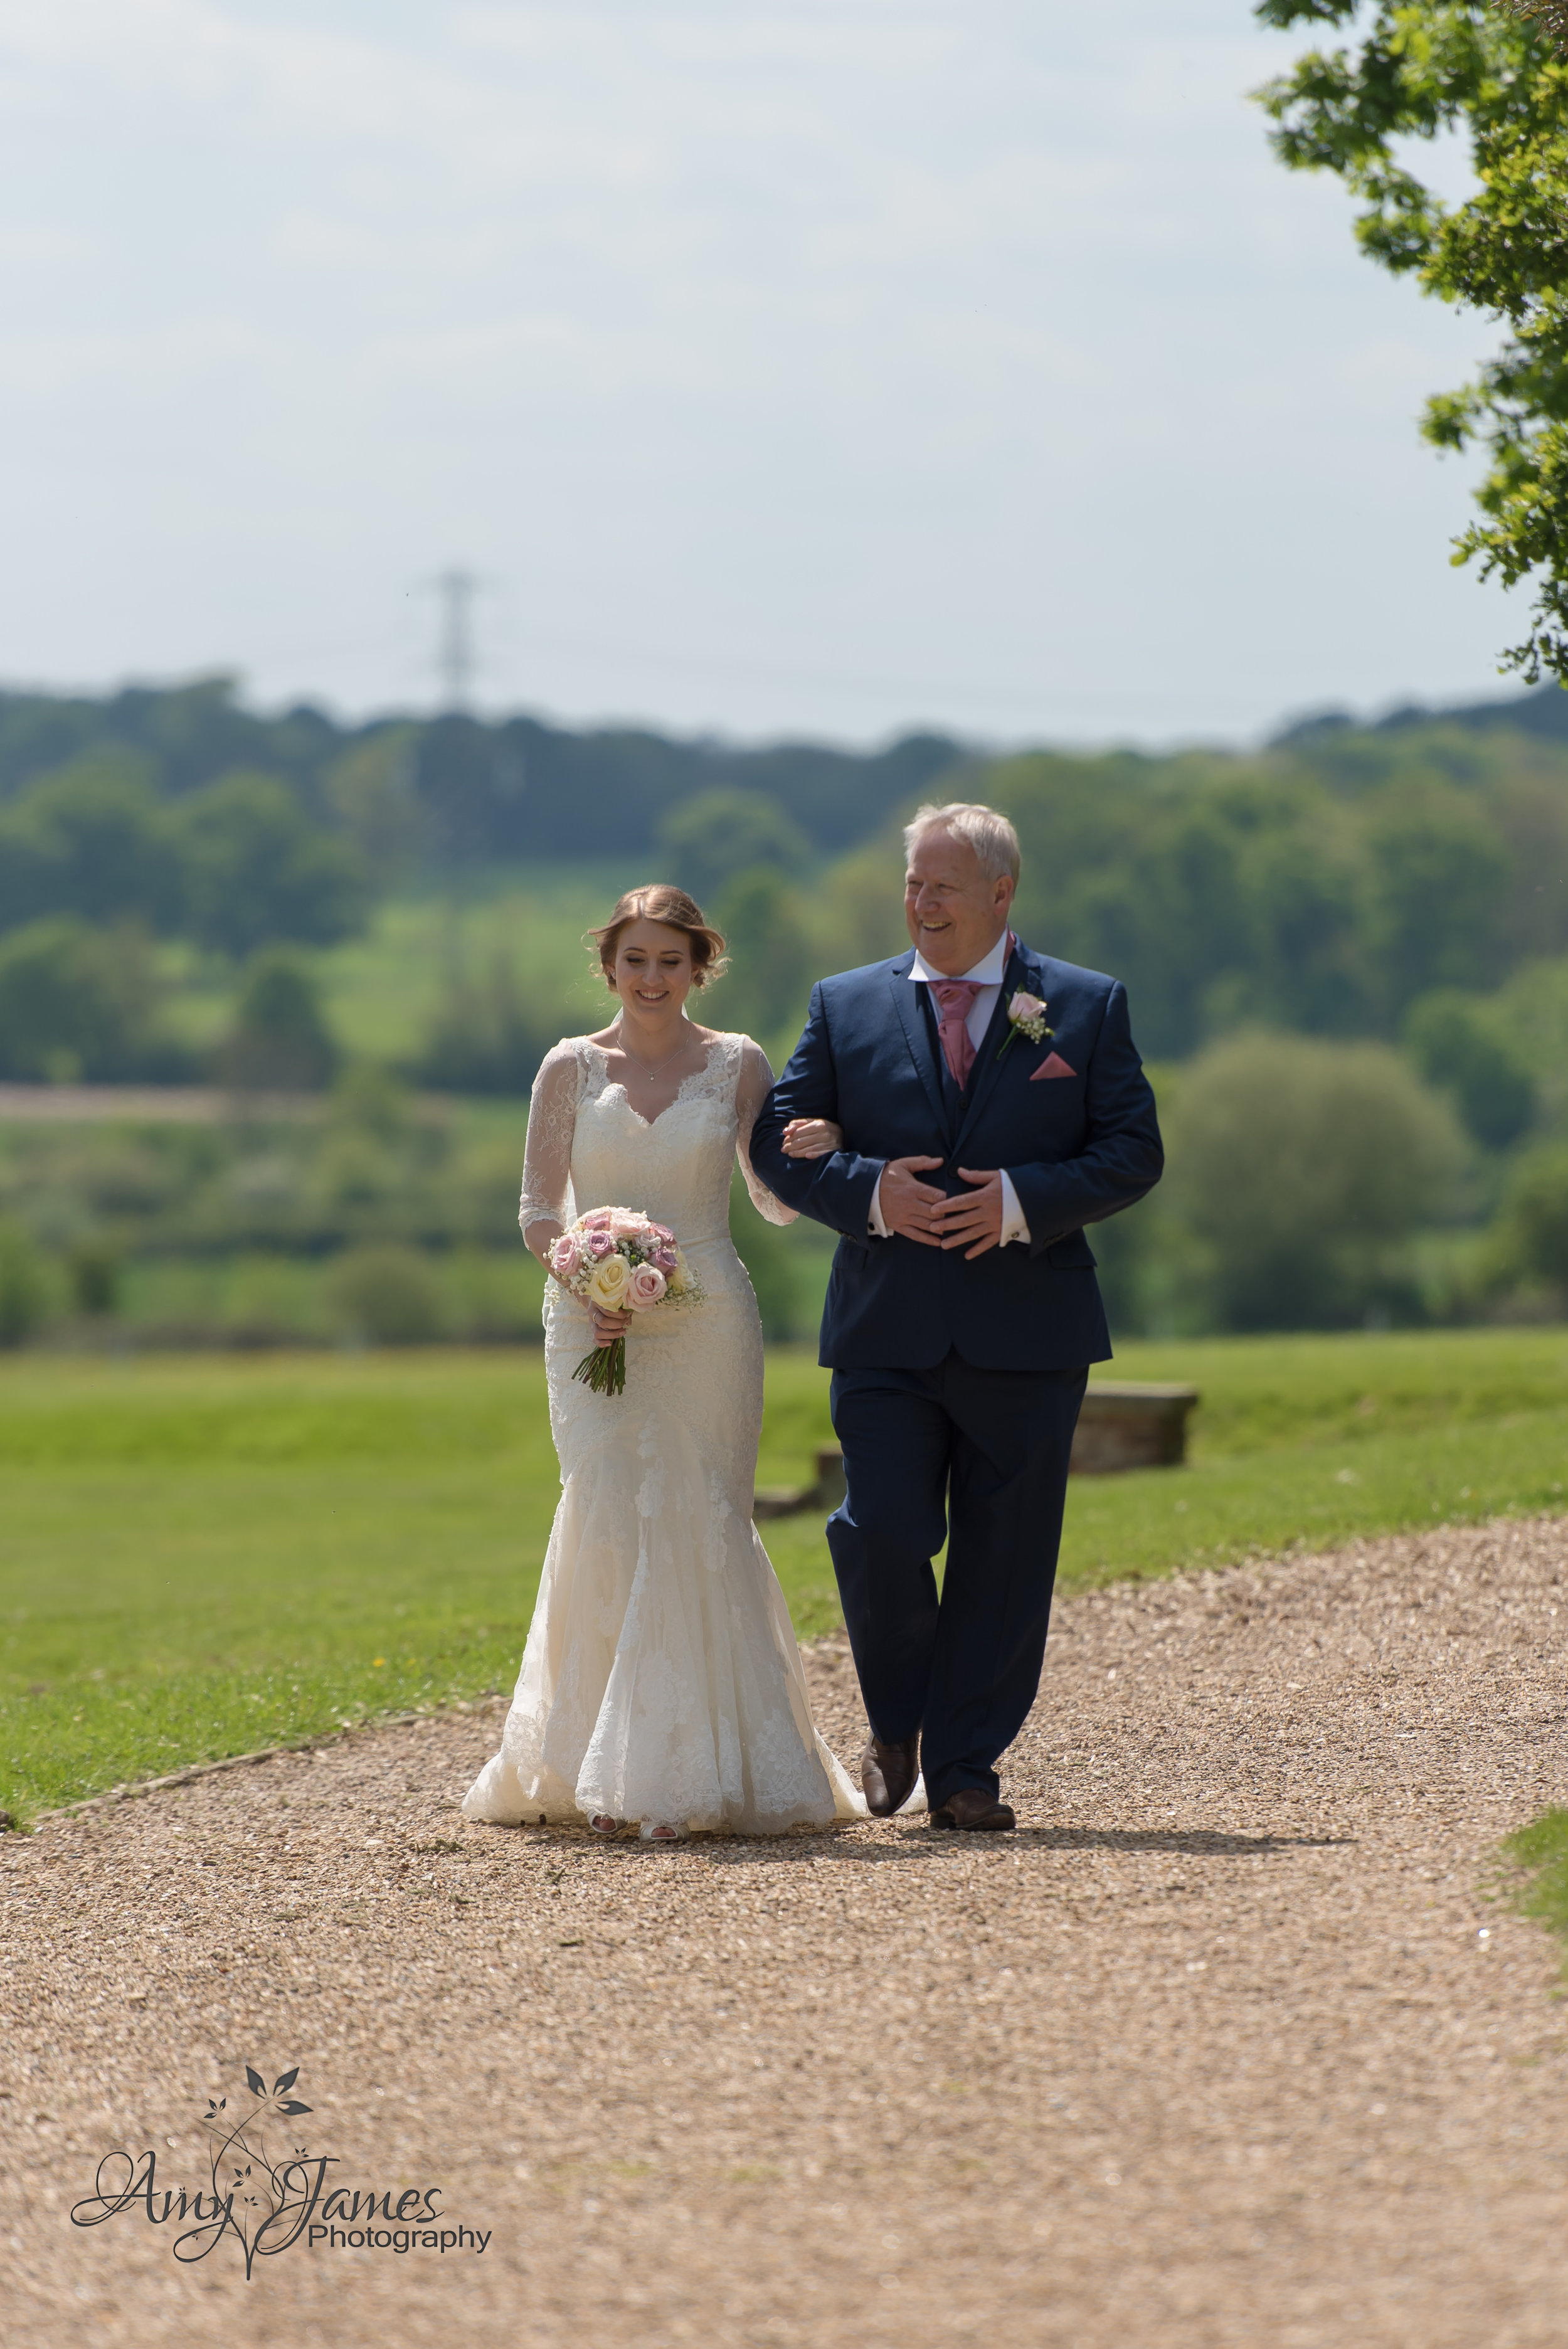 Hampshire Wedding Photographer | Highfield Park Wedding Venue | Highfield Park Wedding Photographer | Fleet wedding Photographer | Amy James Photography